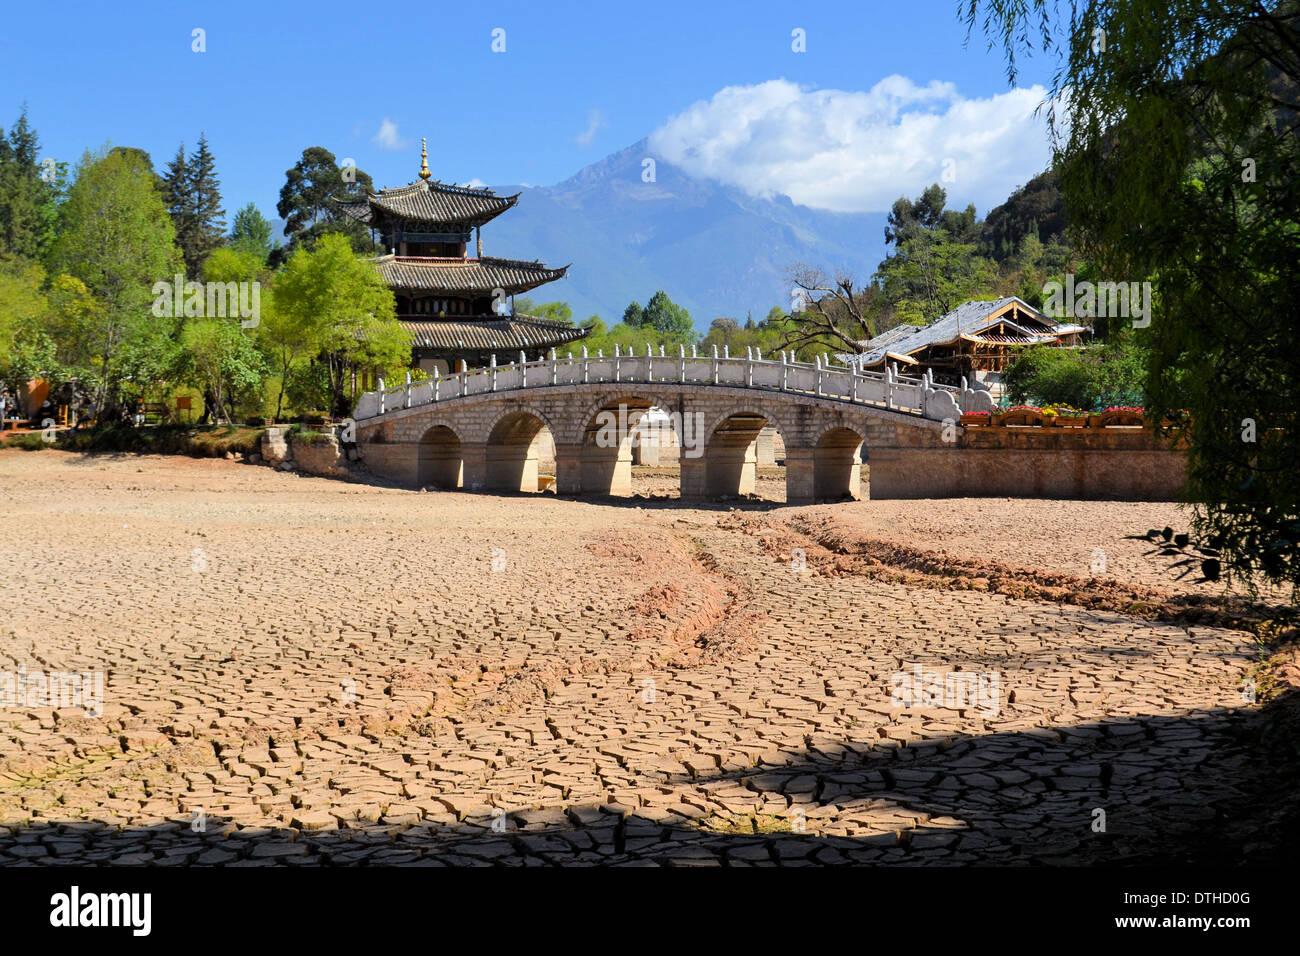 drought in China, soil cracks, global warming Stock Photo